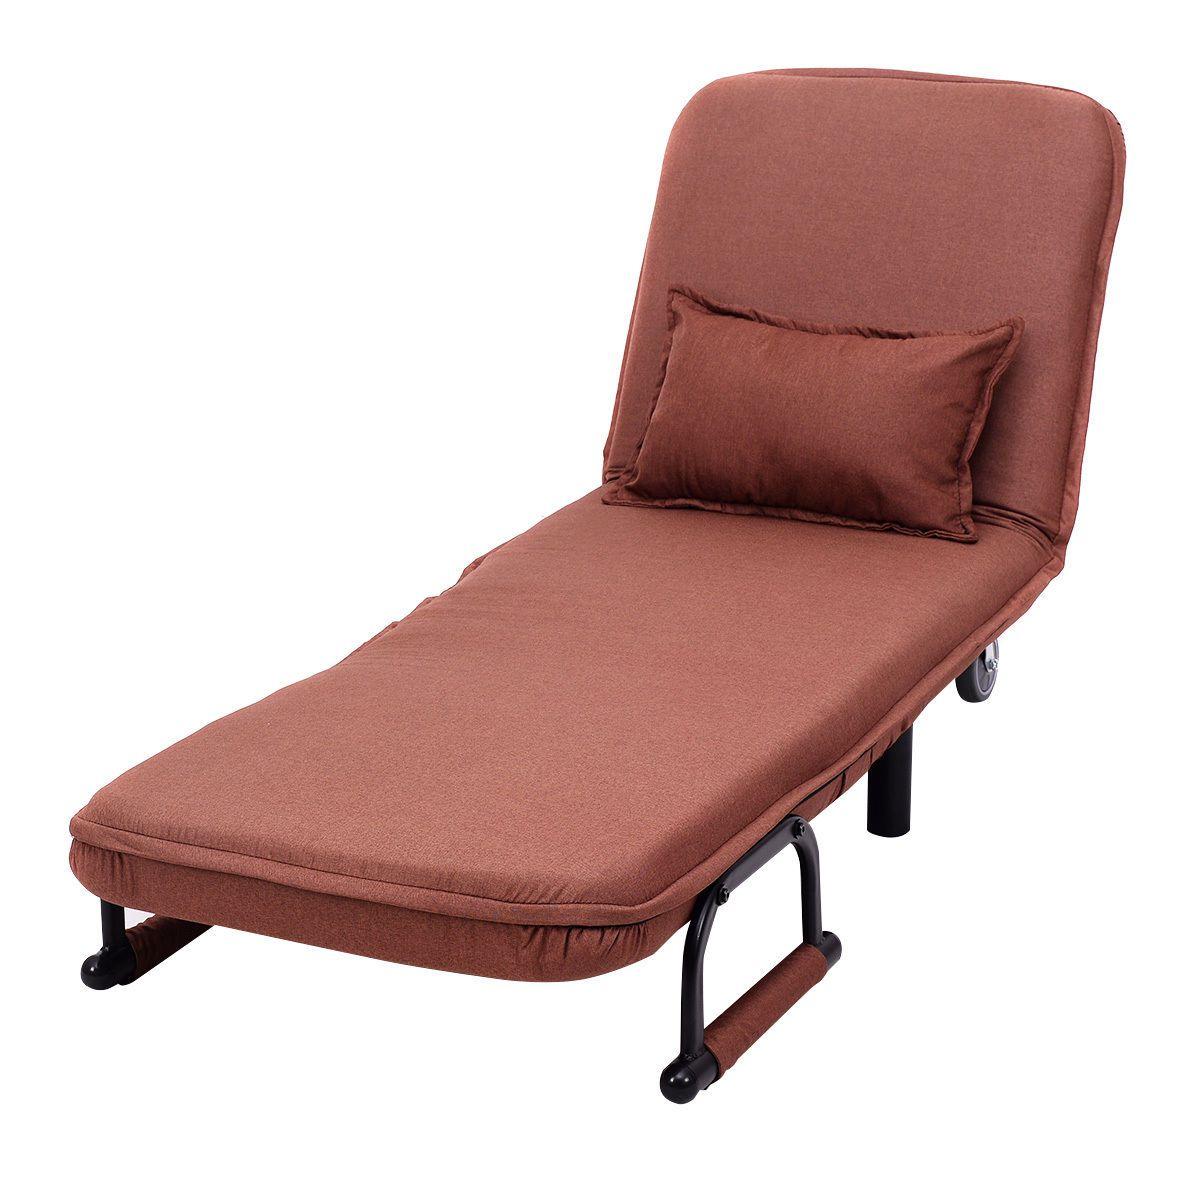 Convertible Folding Leisure Recliner Sofa BedCoffee